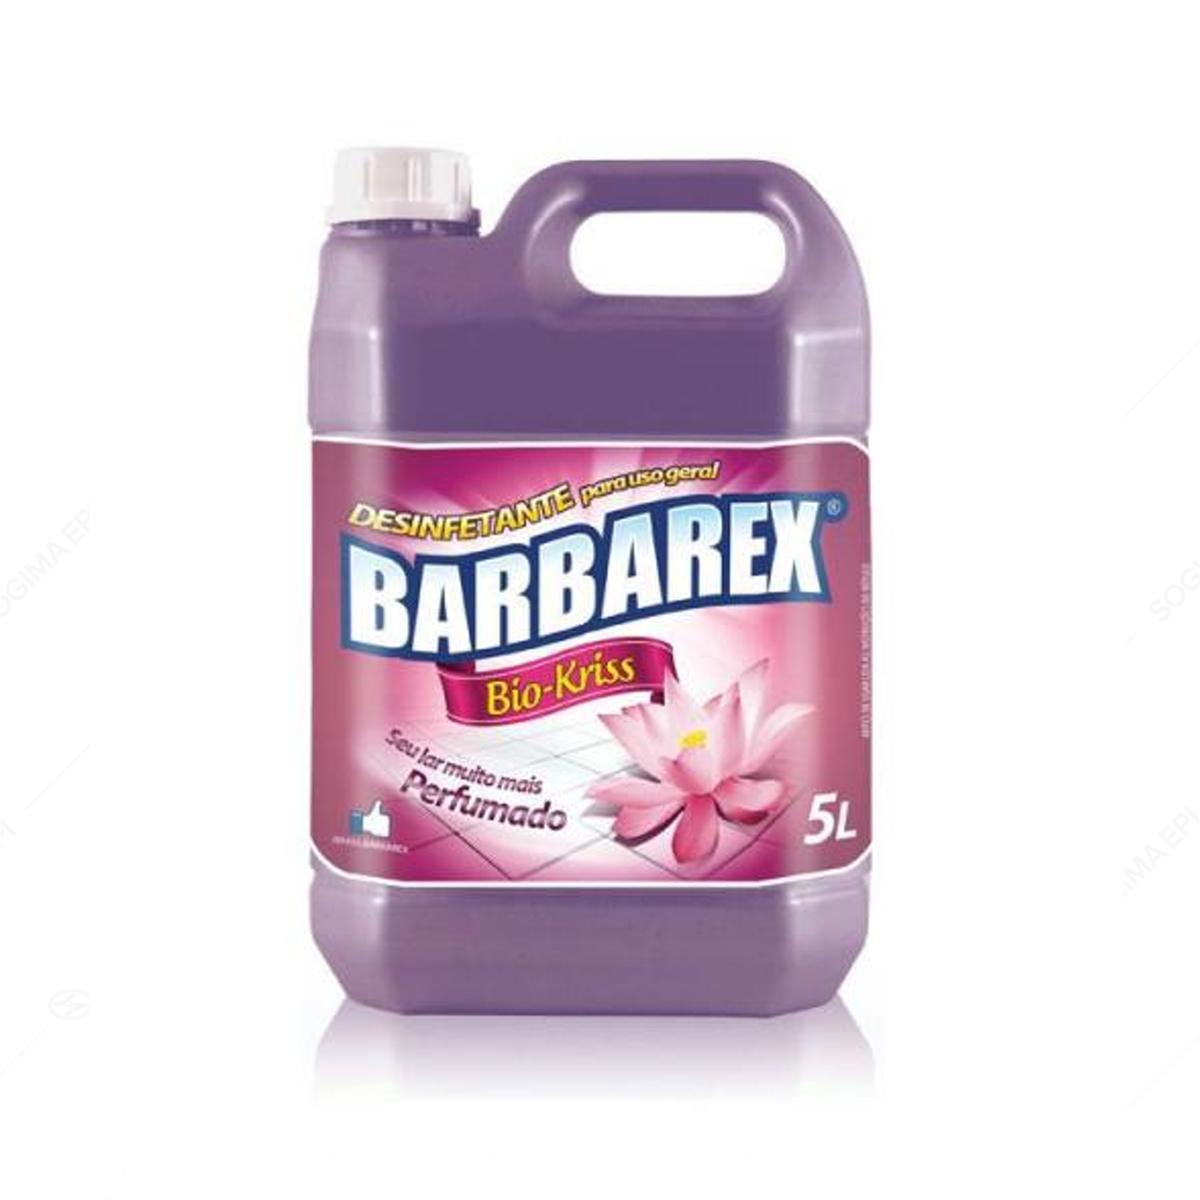 Desinfetante Pronto Uso barbarex Bio Kriss 5L - Floral